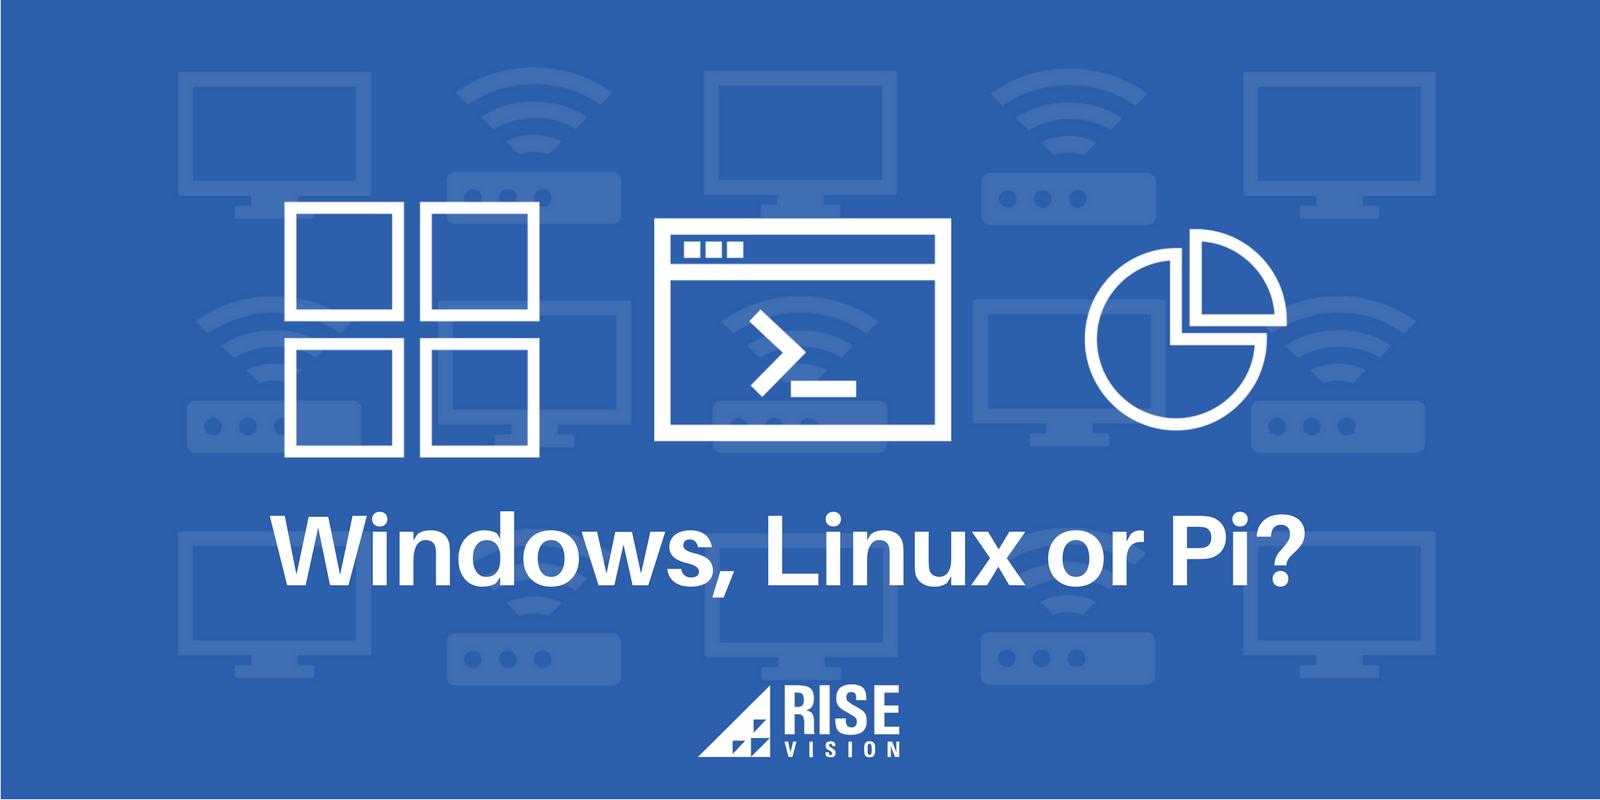 Windows Linux or Pi for My Media Player Digital Signage.png